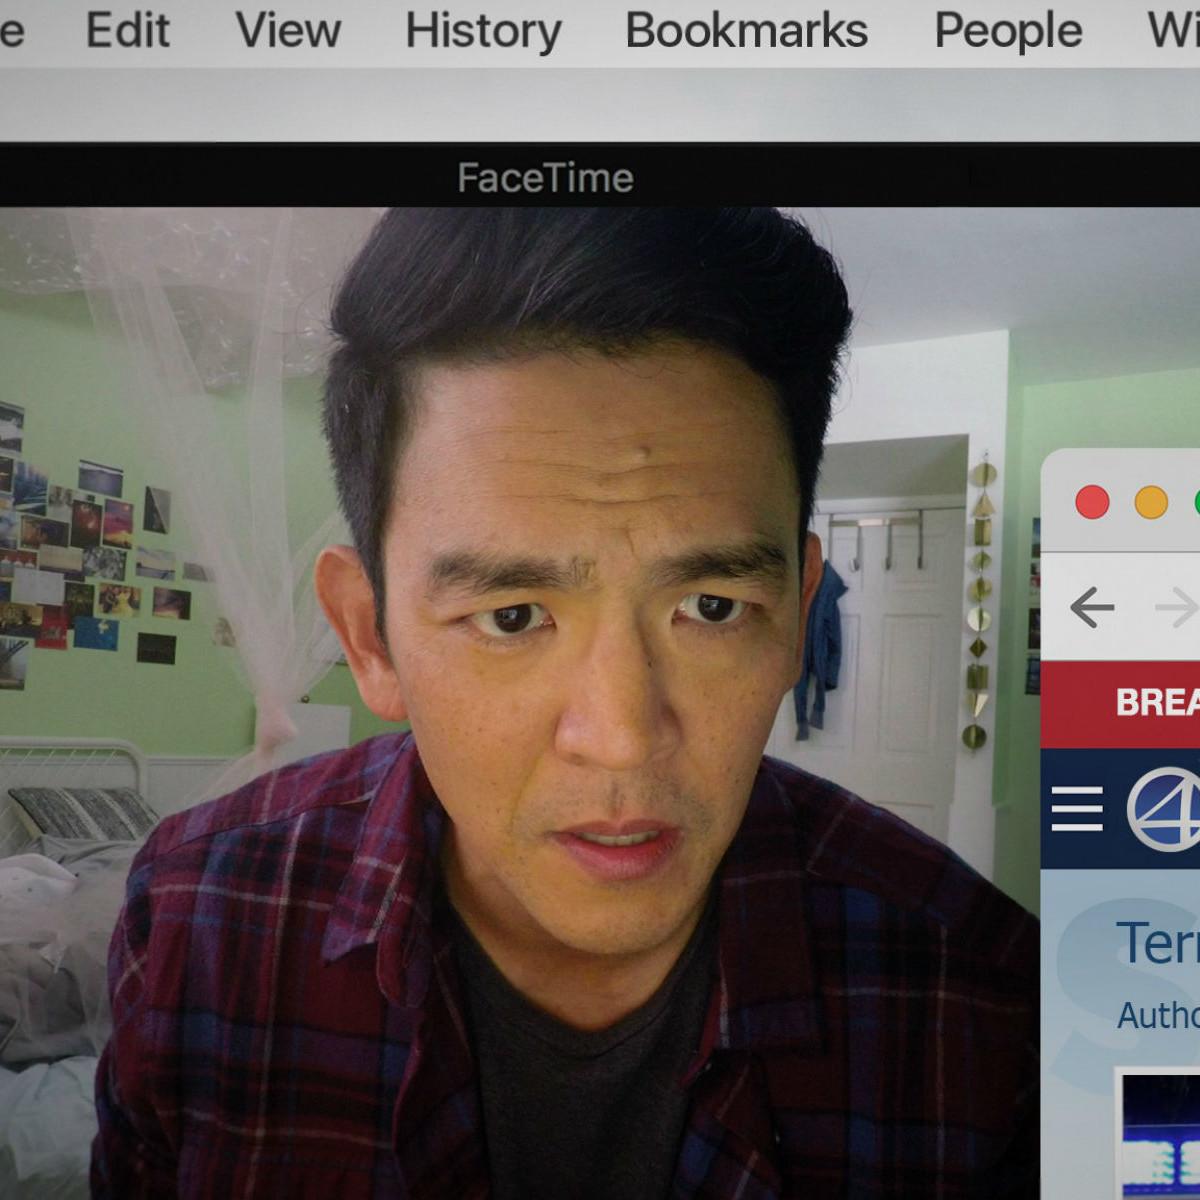 John Cho in Searching